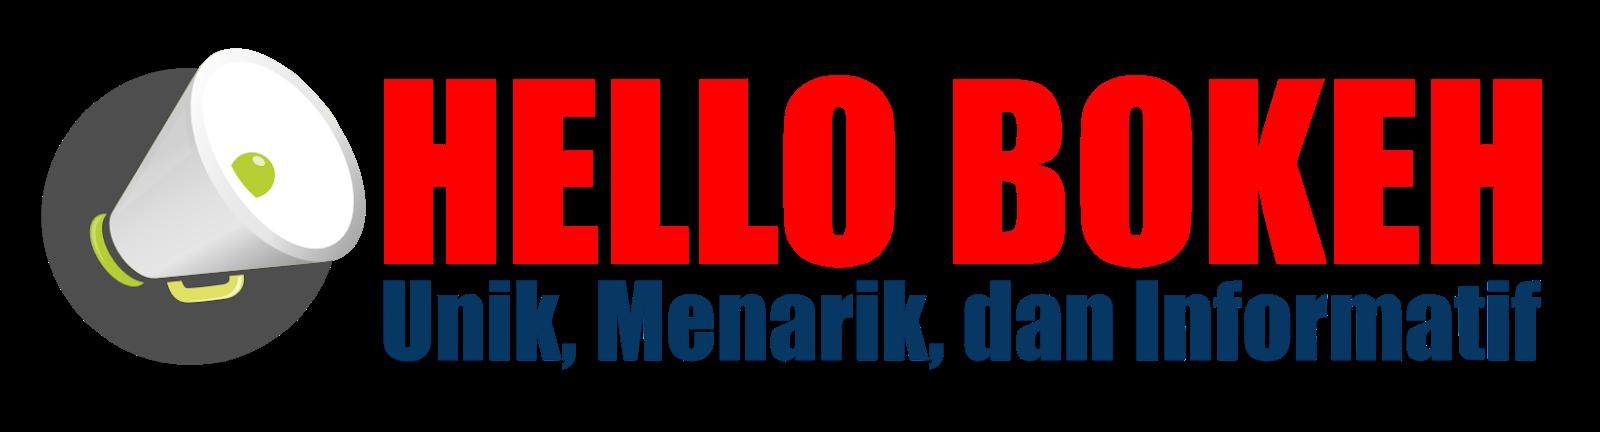 Hello Bokeh